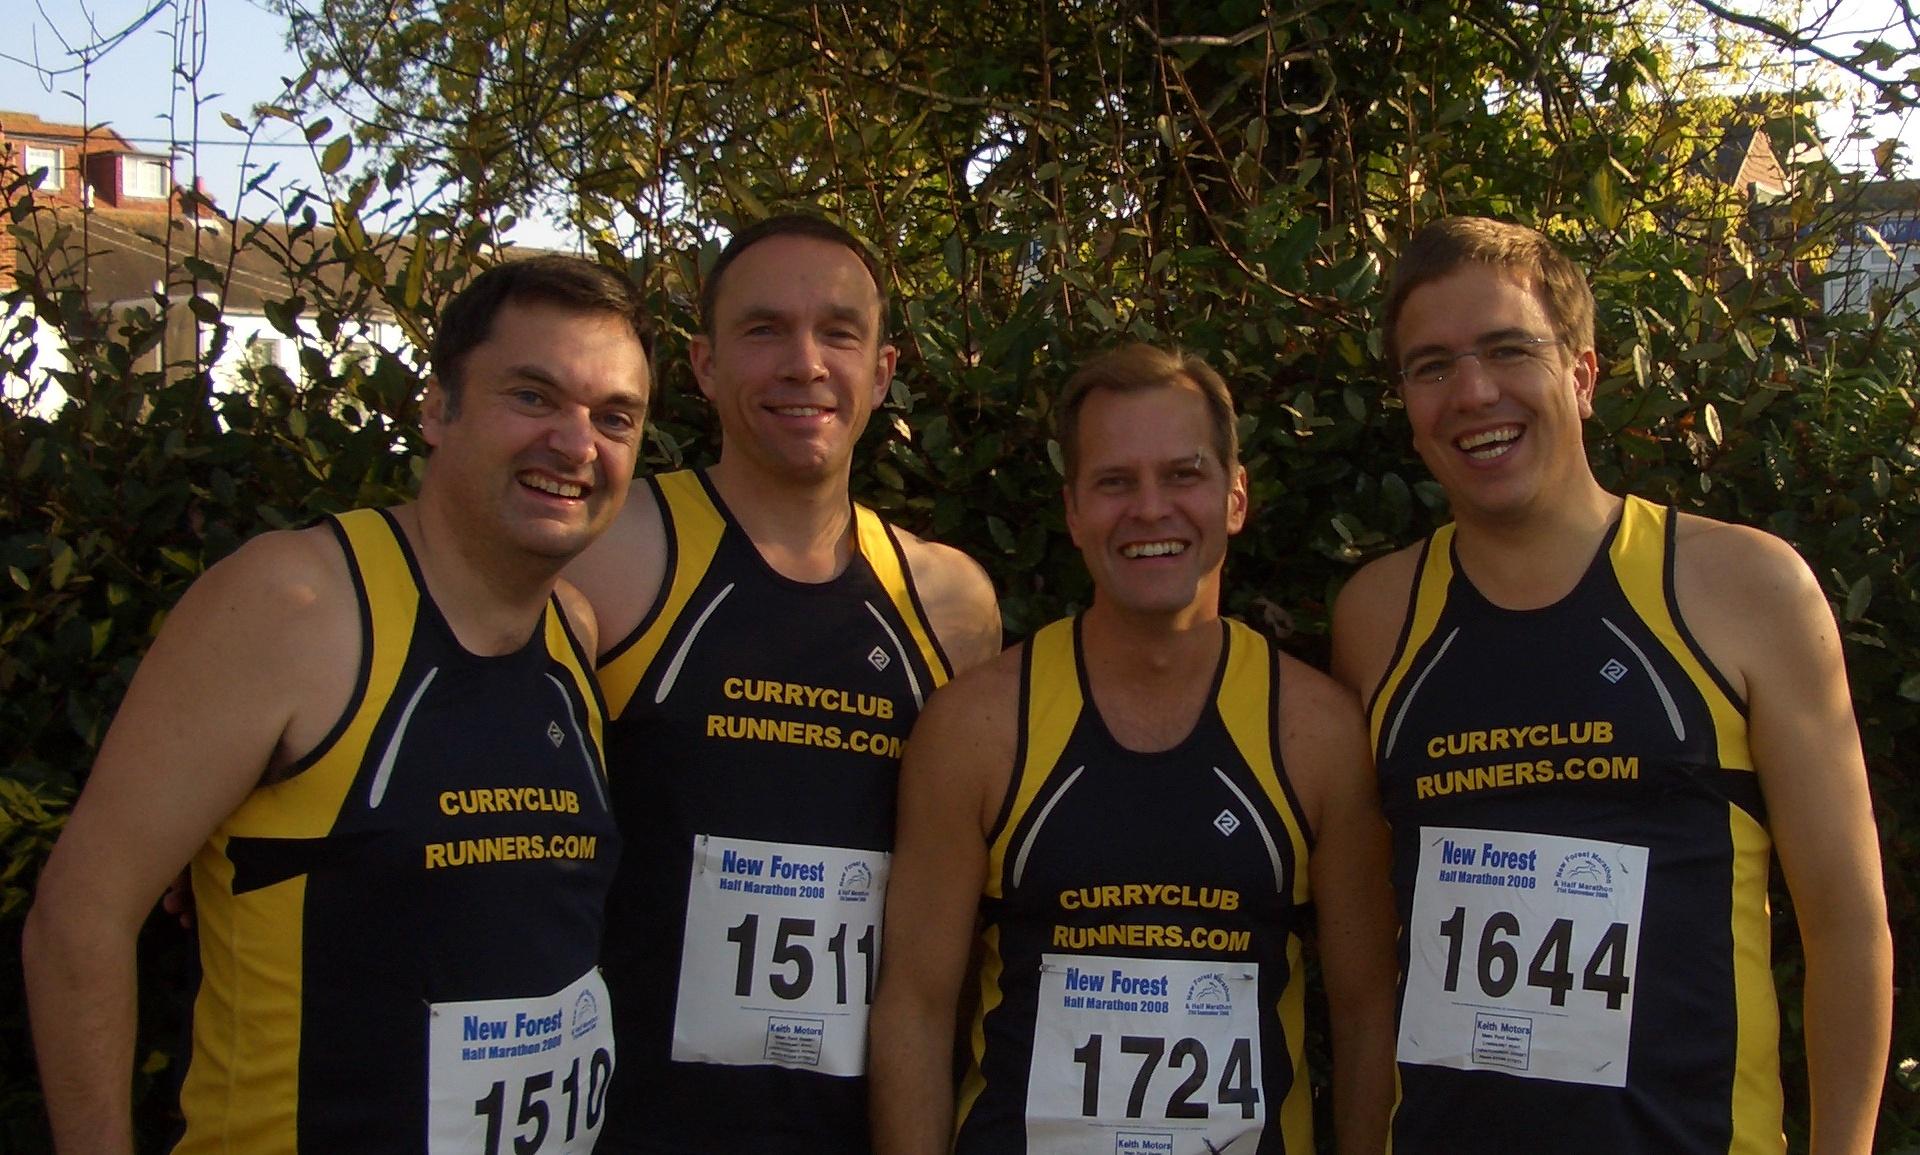 Curry Club runners before the half marathon